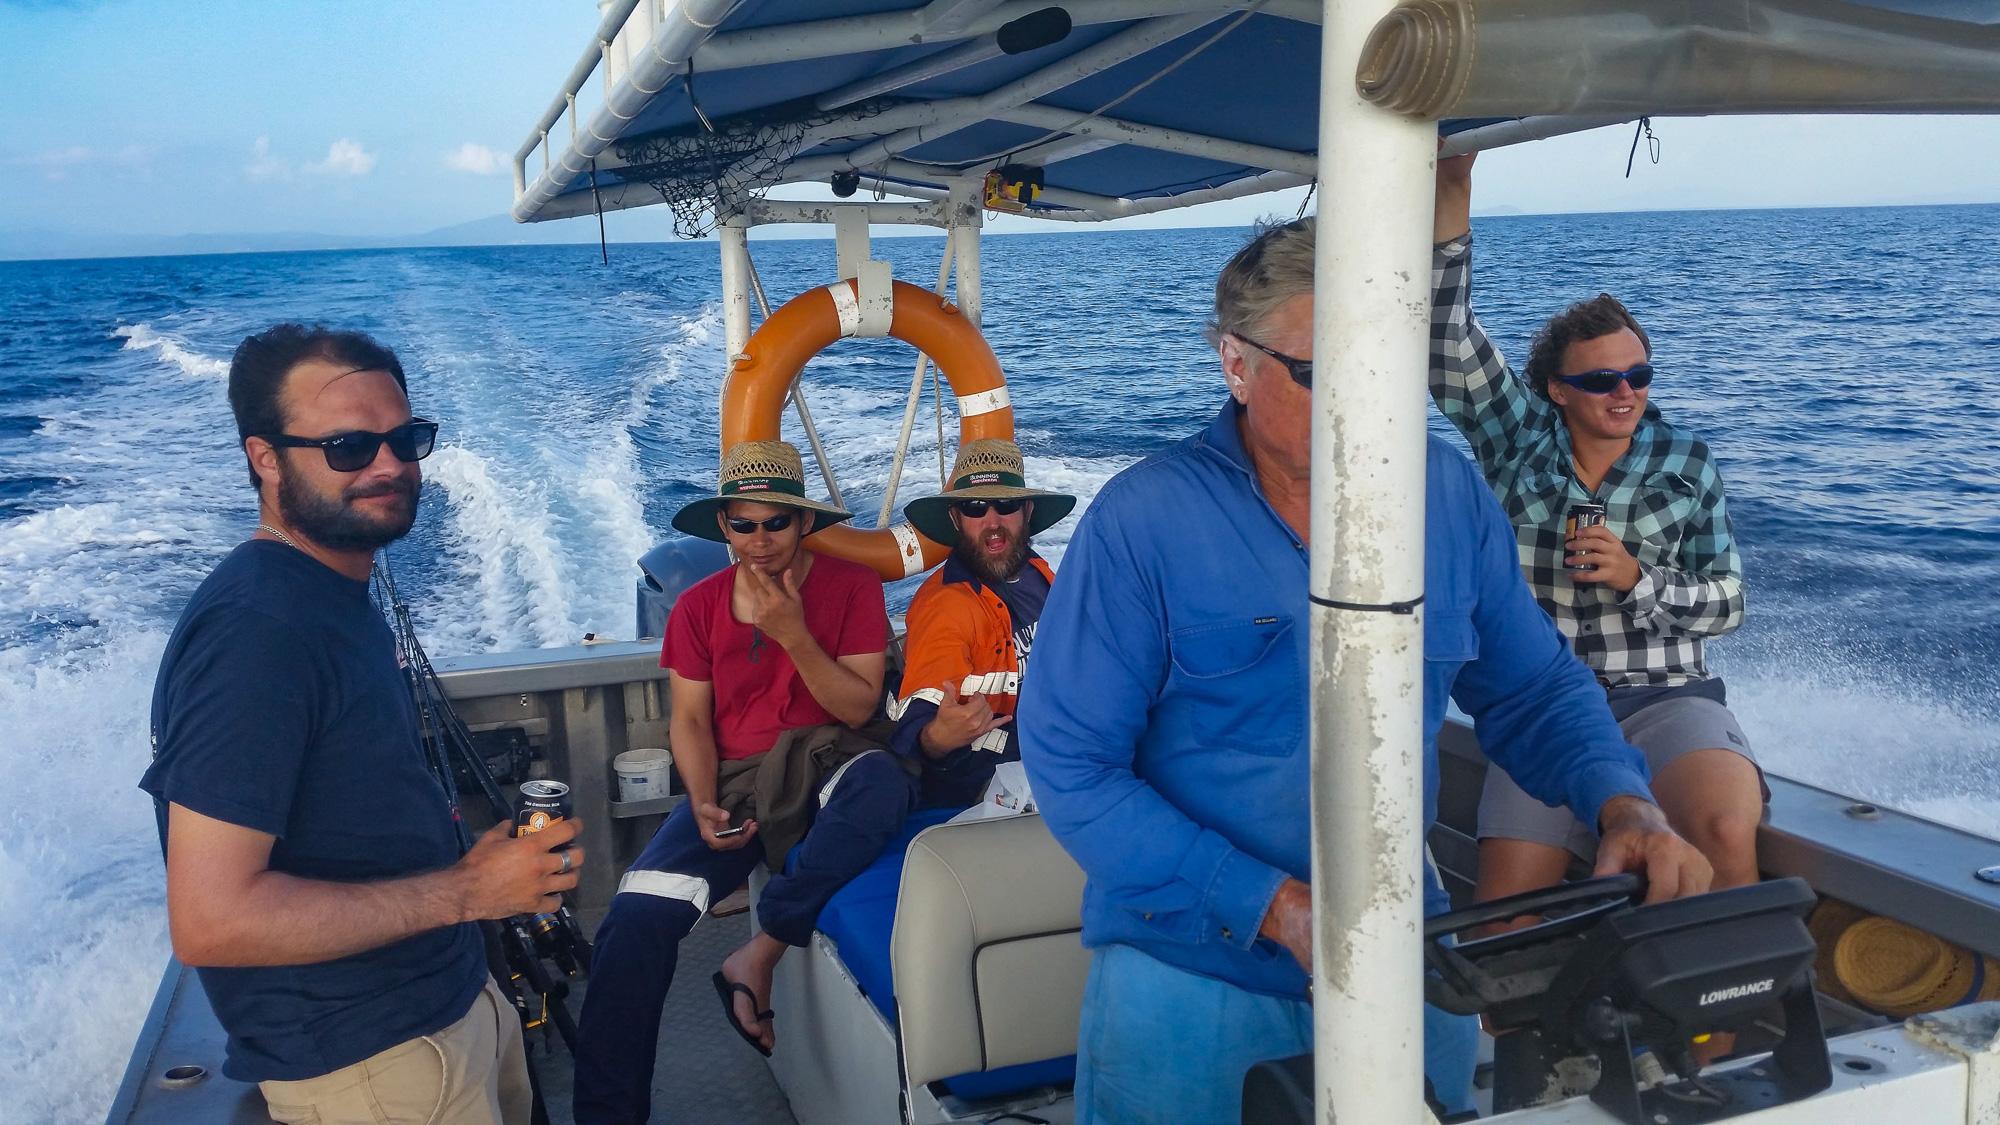 mission-beach-fishing-charter-123